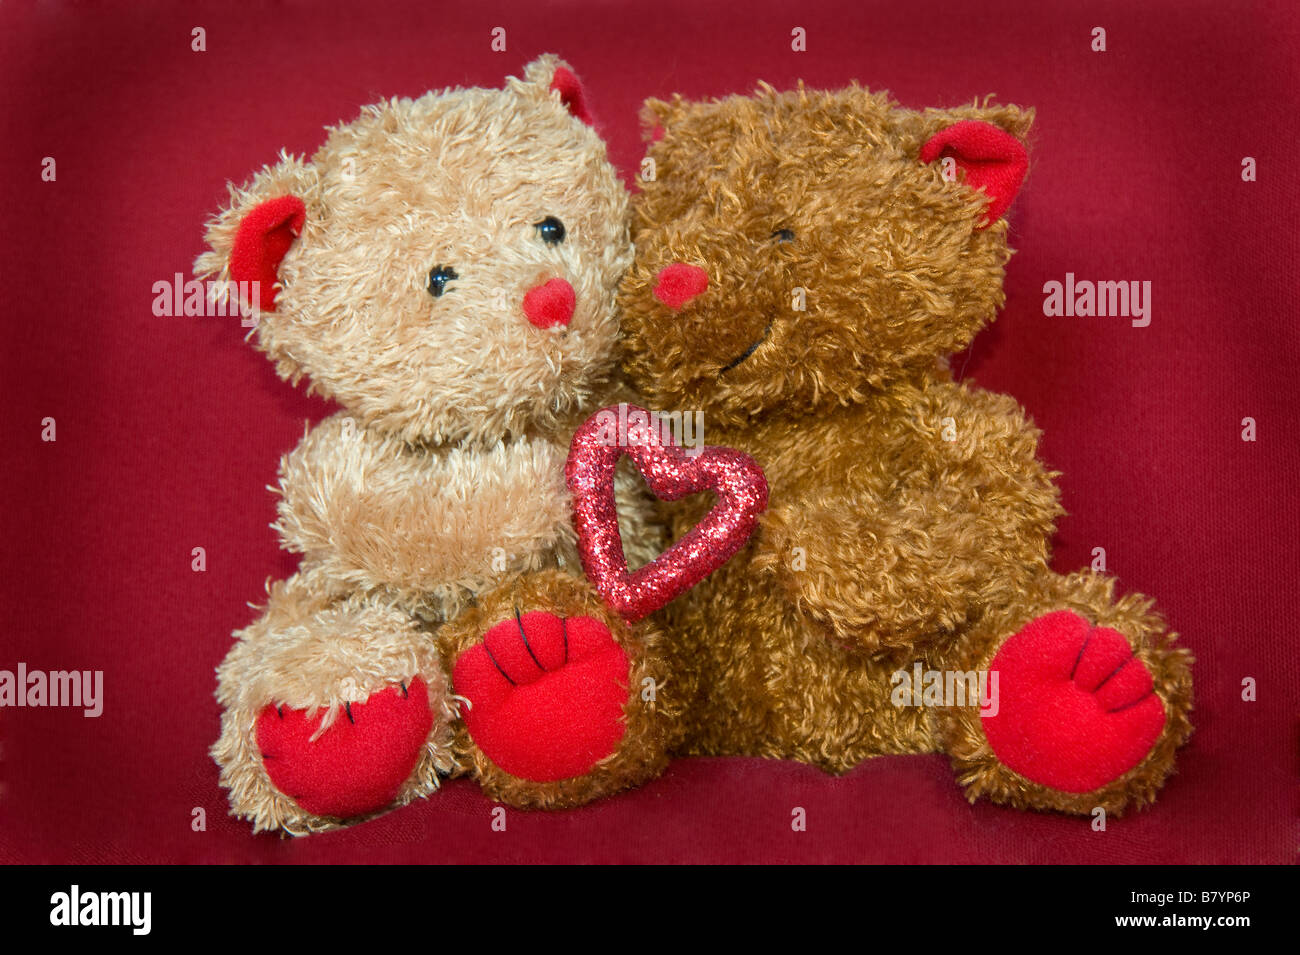 teddy bears stockfotos teddy bears bilder alamy. Black Bedroom Furniture Sets. Home Design Ideas